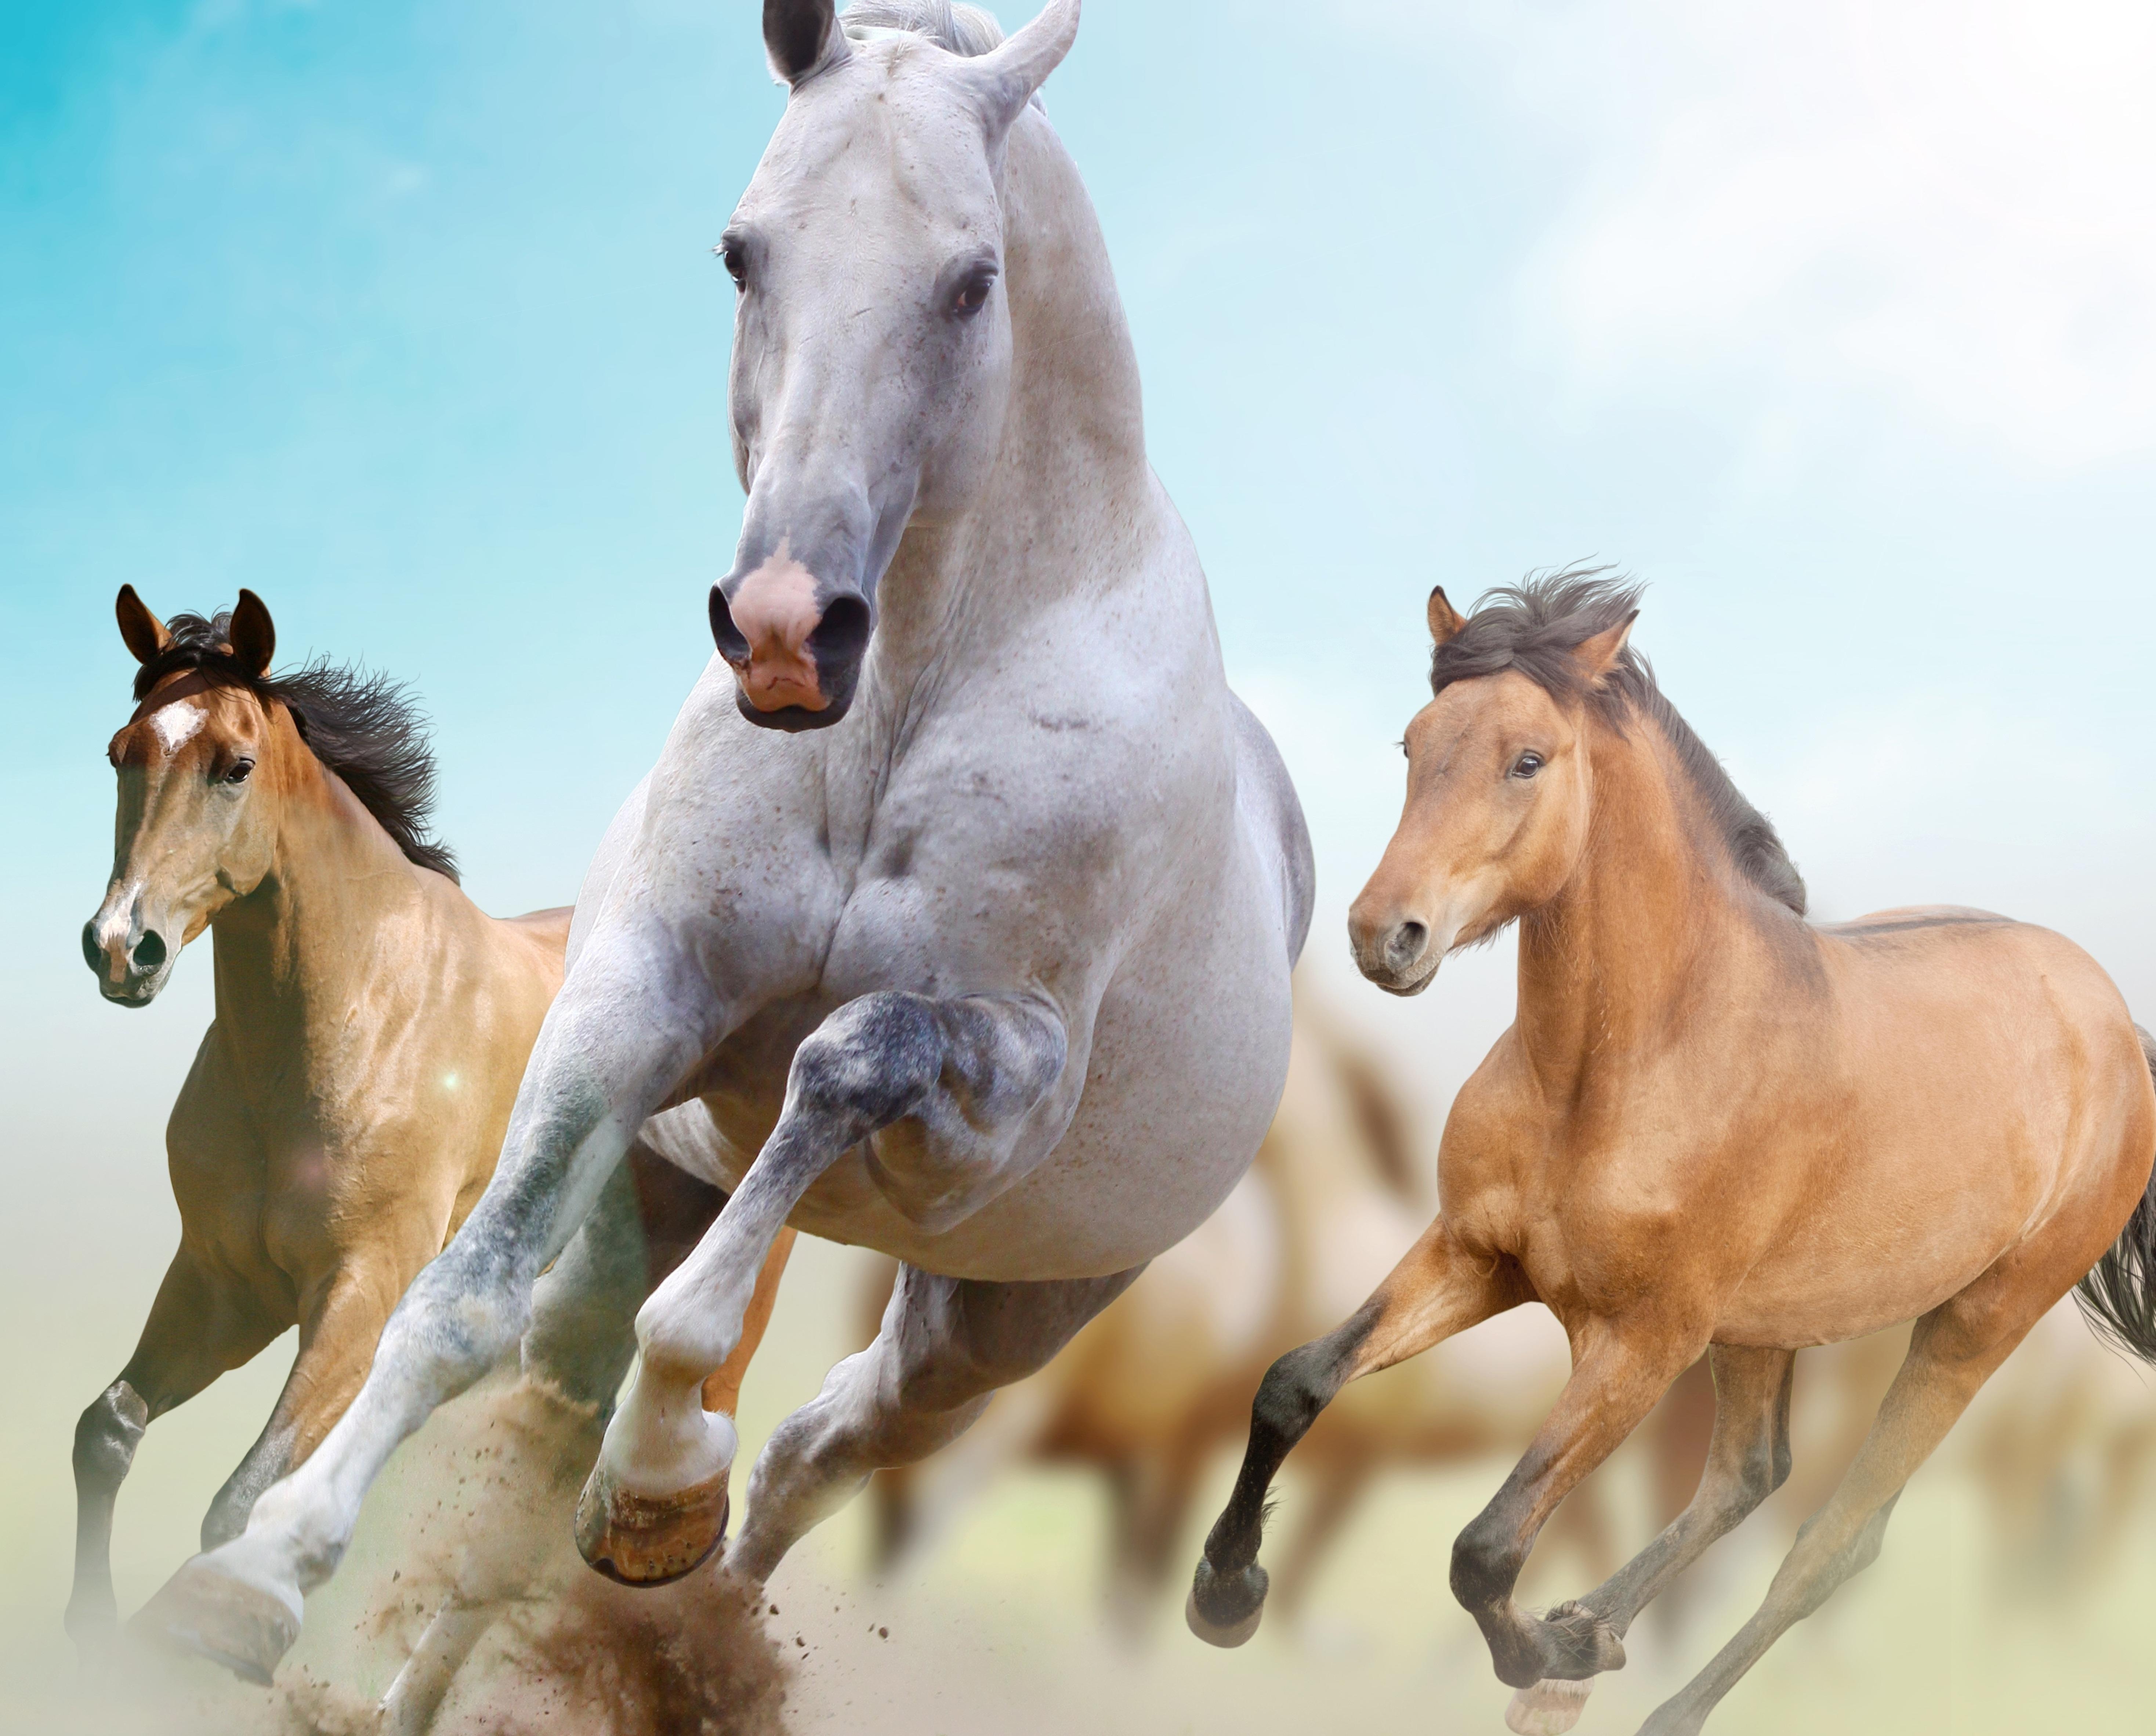 Wallpaper Horses Running Freedom 5873x4729